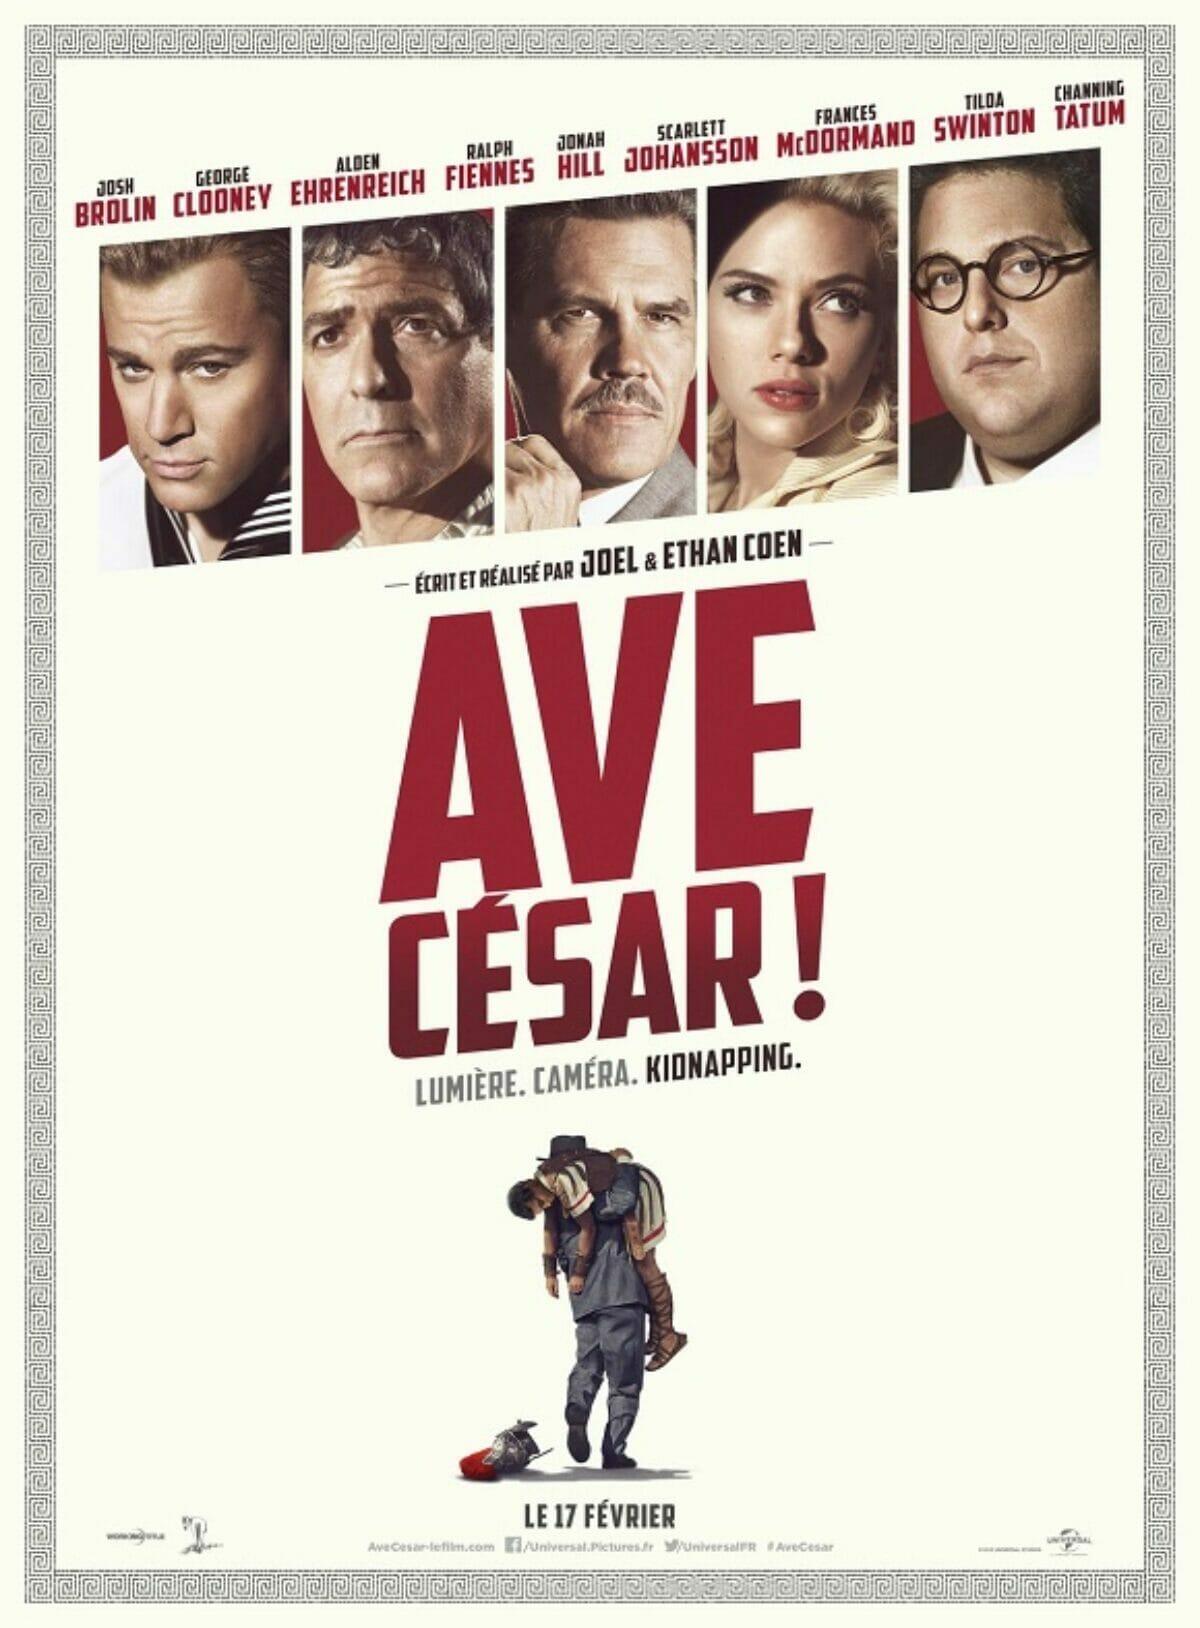 Ave-César-poster